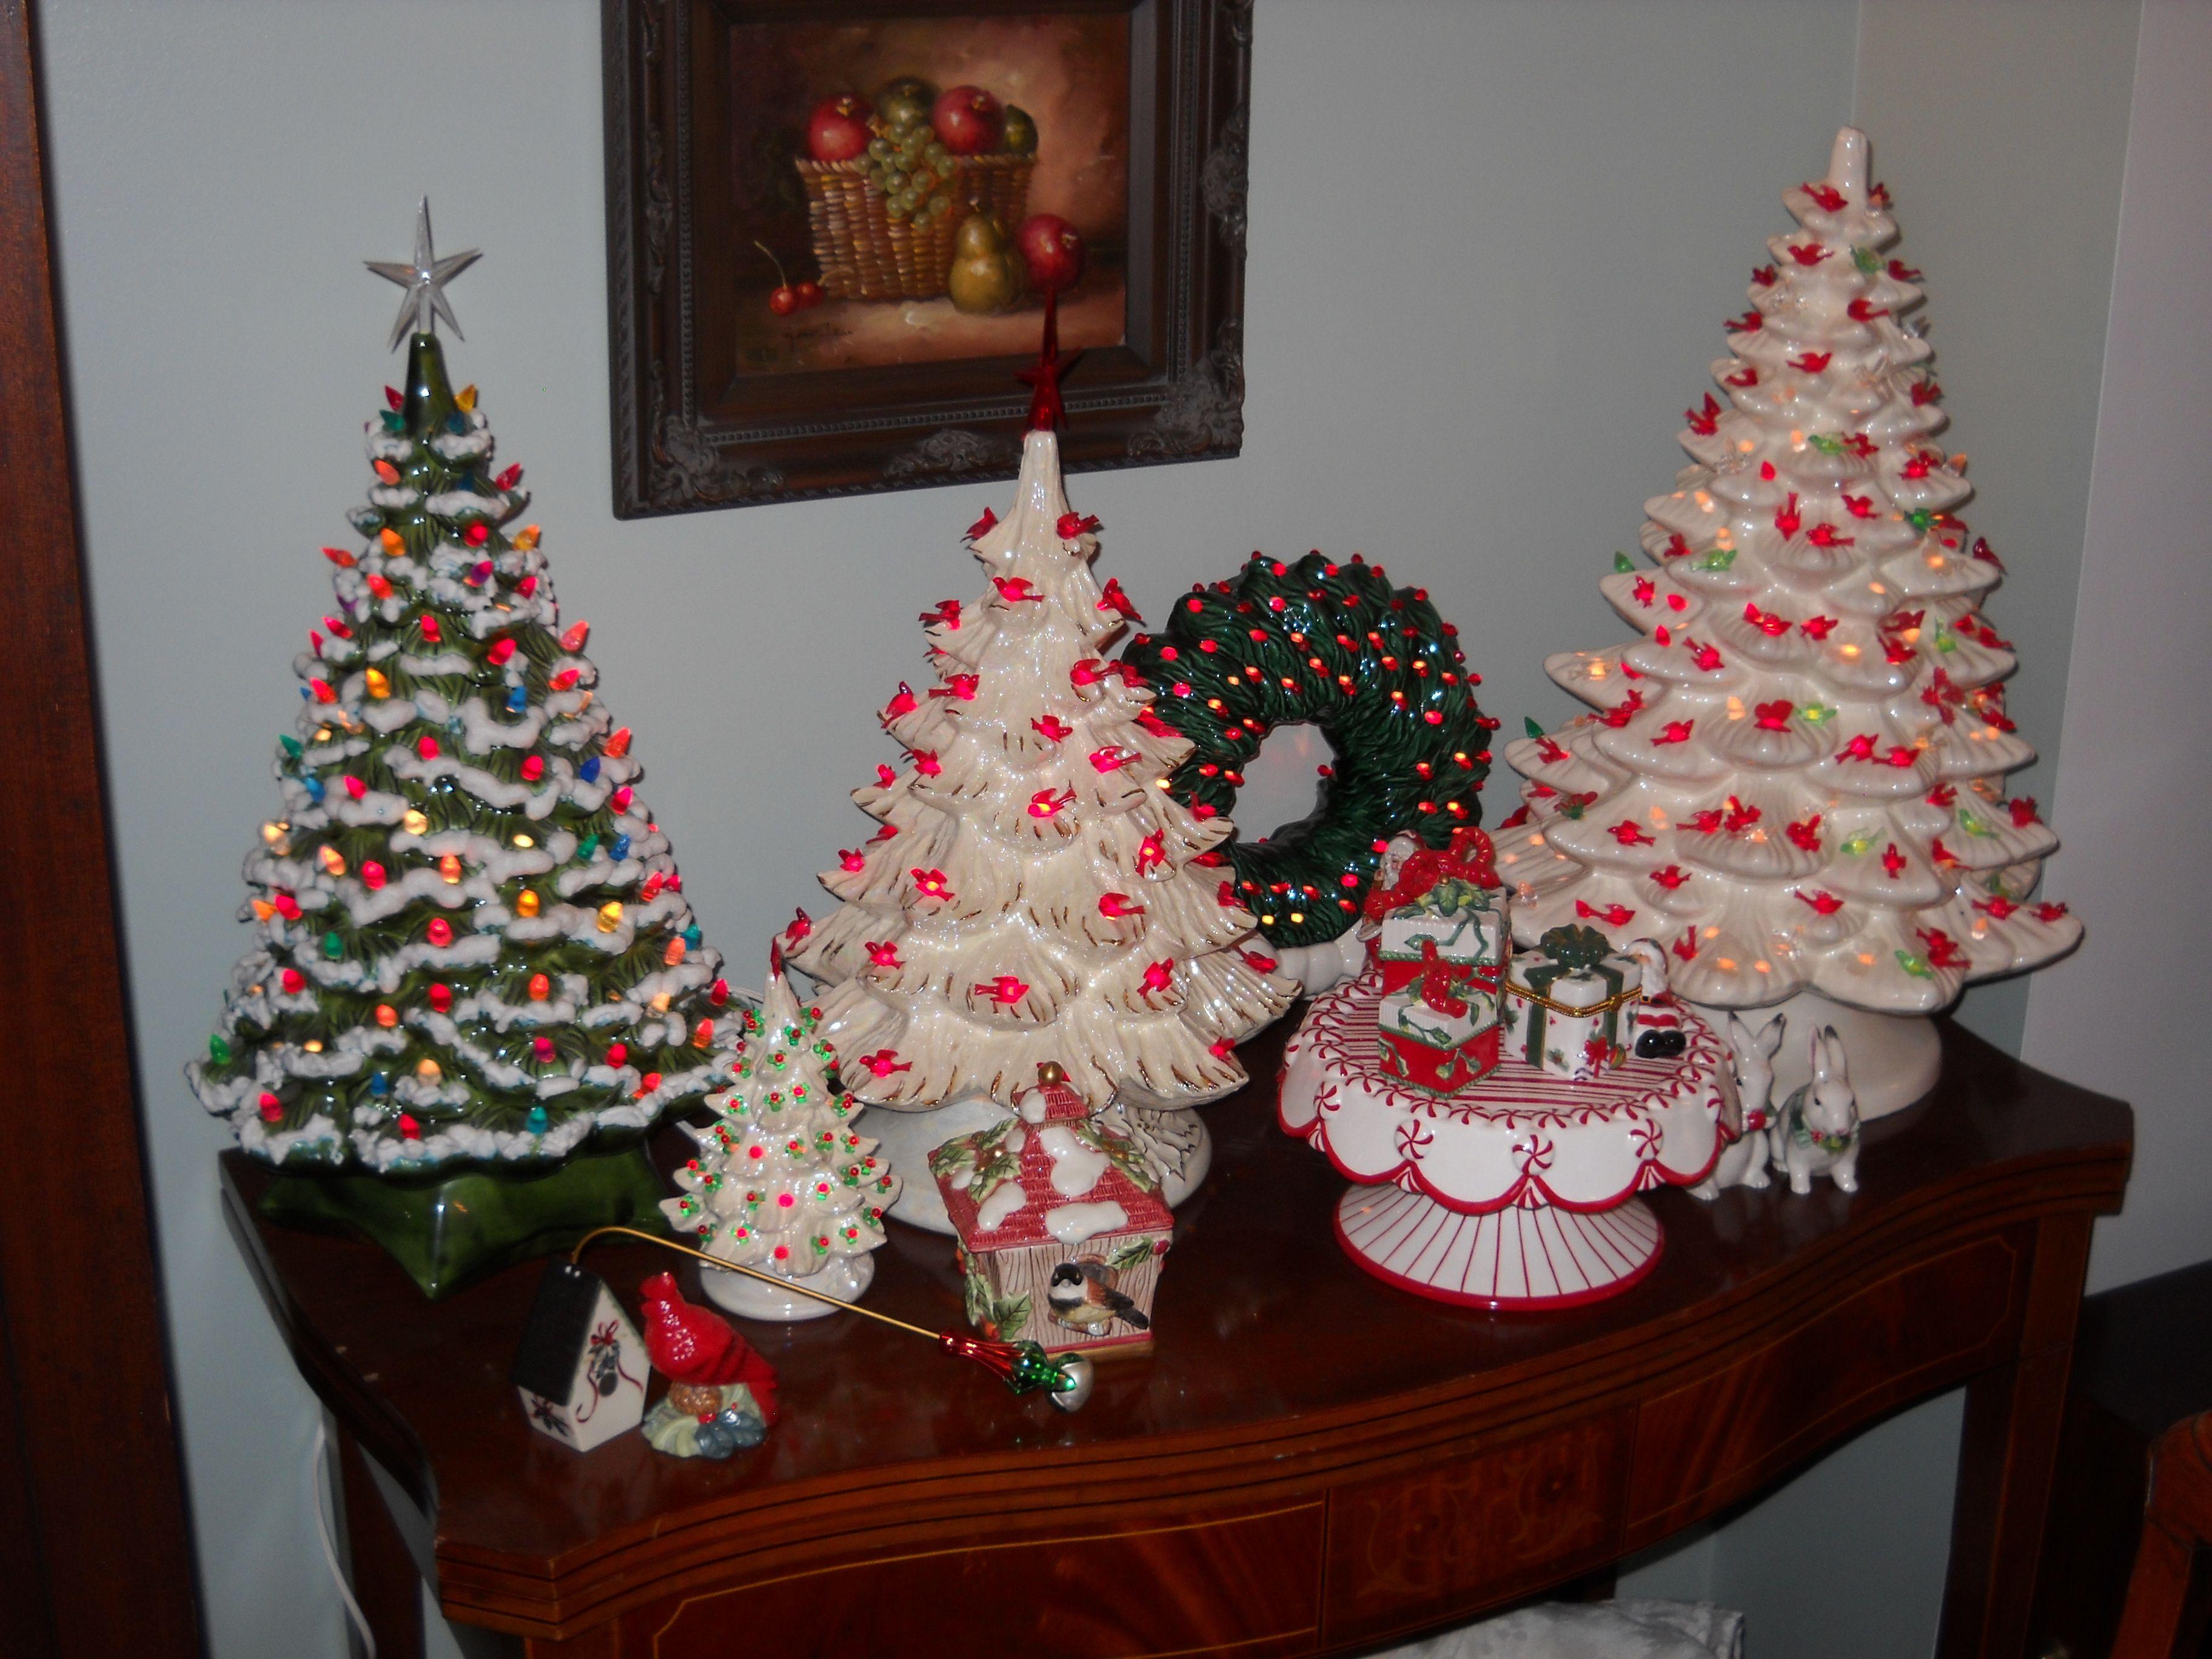 Vintage Ceramic Christmas Trees And Wreath Ca 1950s Vintage Ceramic Christmas Tree Vintage Christmas Decorations 1950s Ceramic Christmas Trees